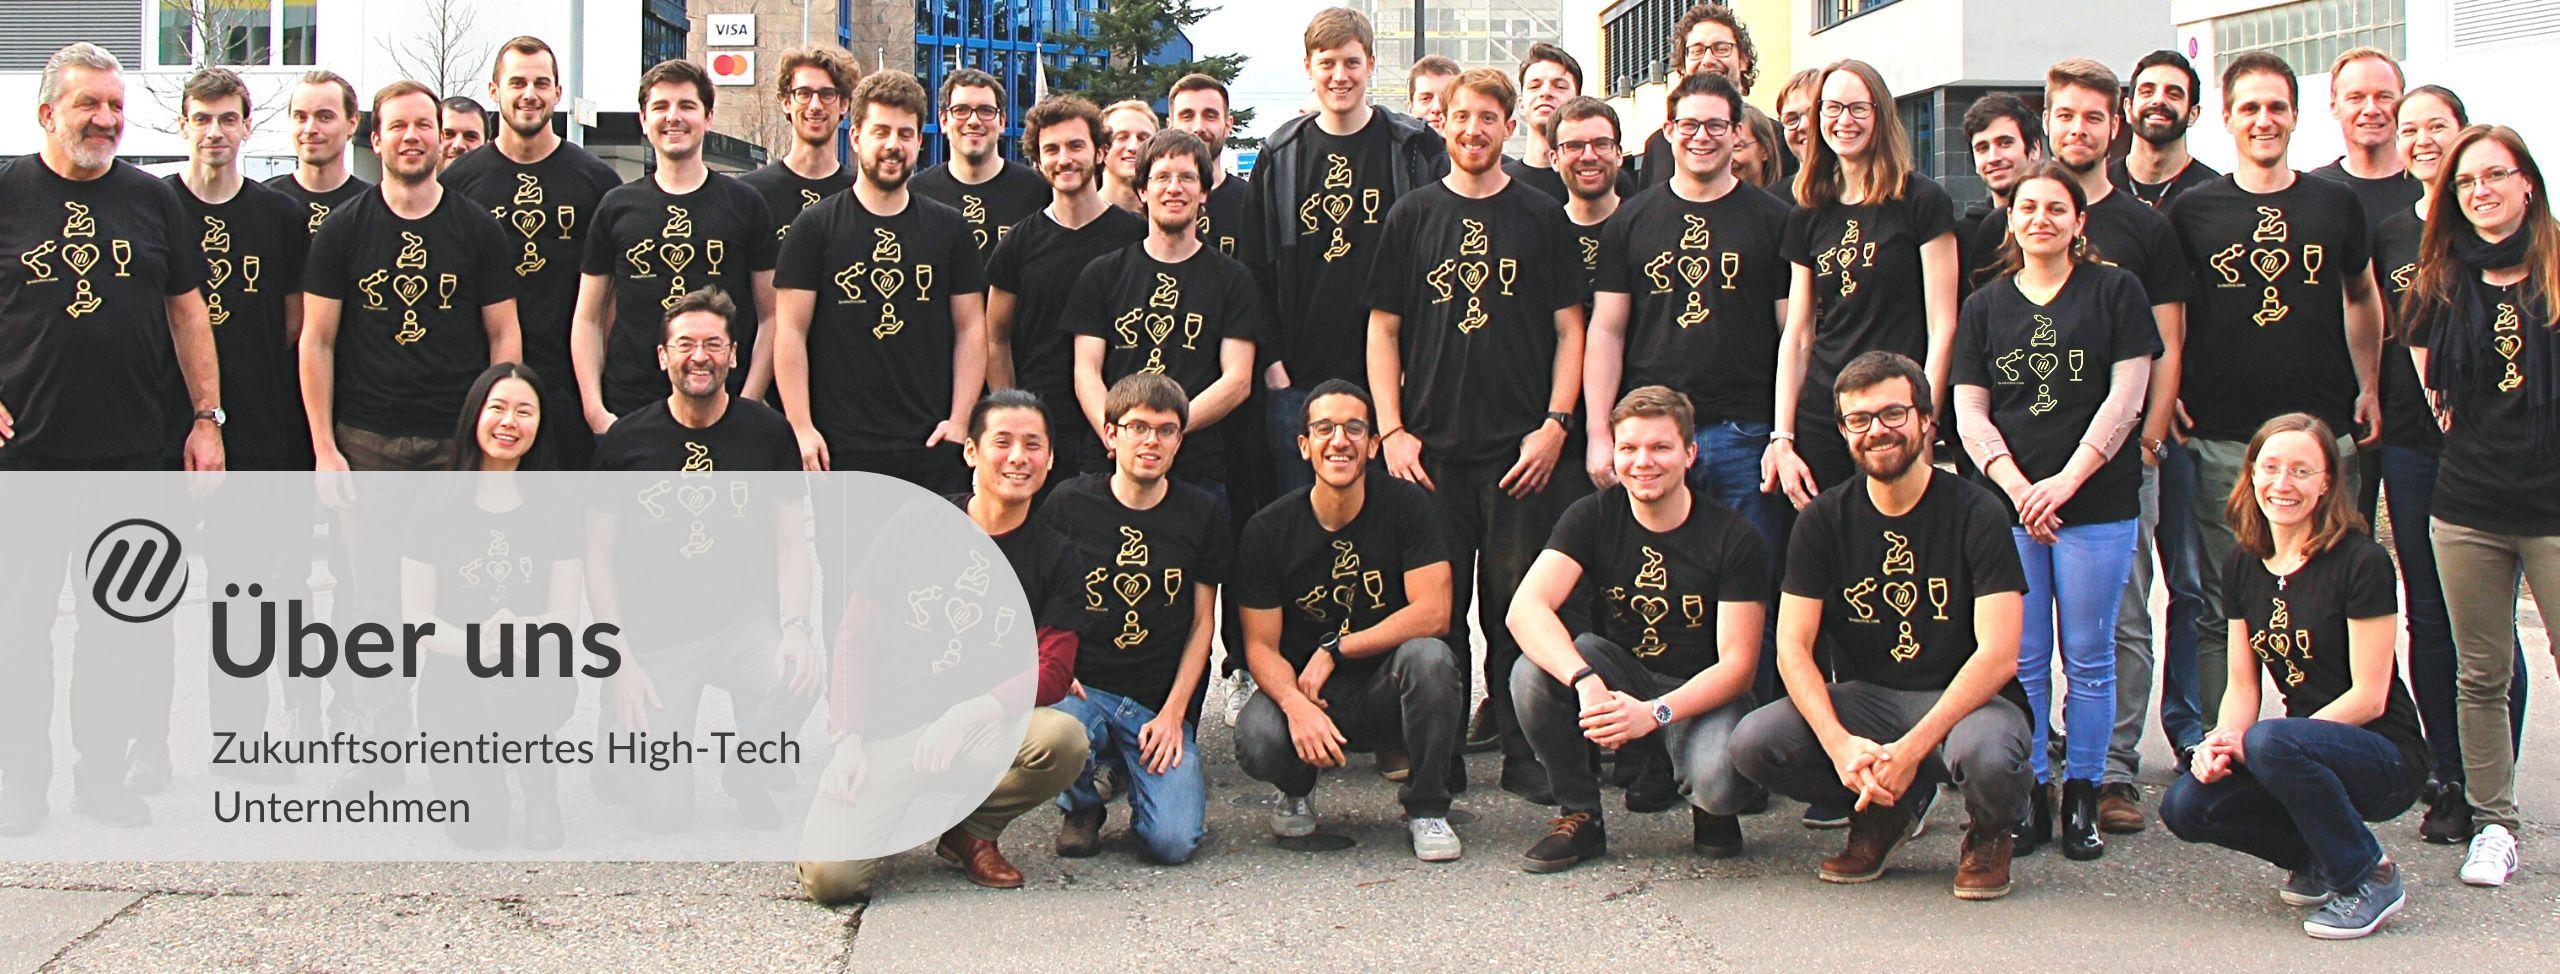 Future Oriented High Tech Company - F&P Robotics